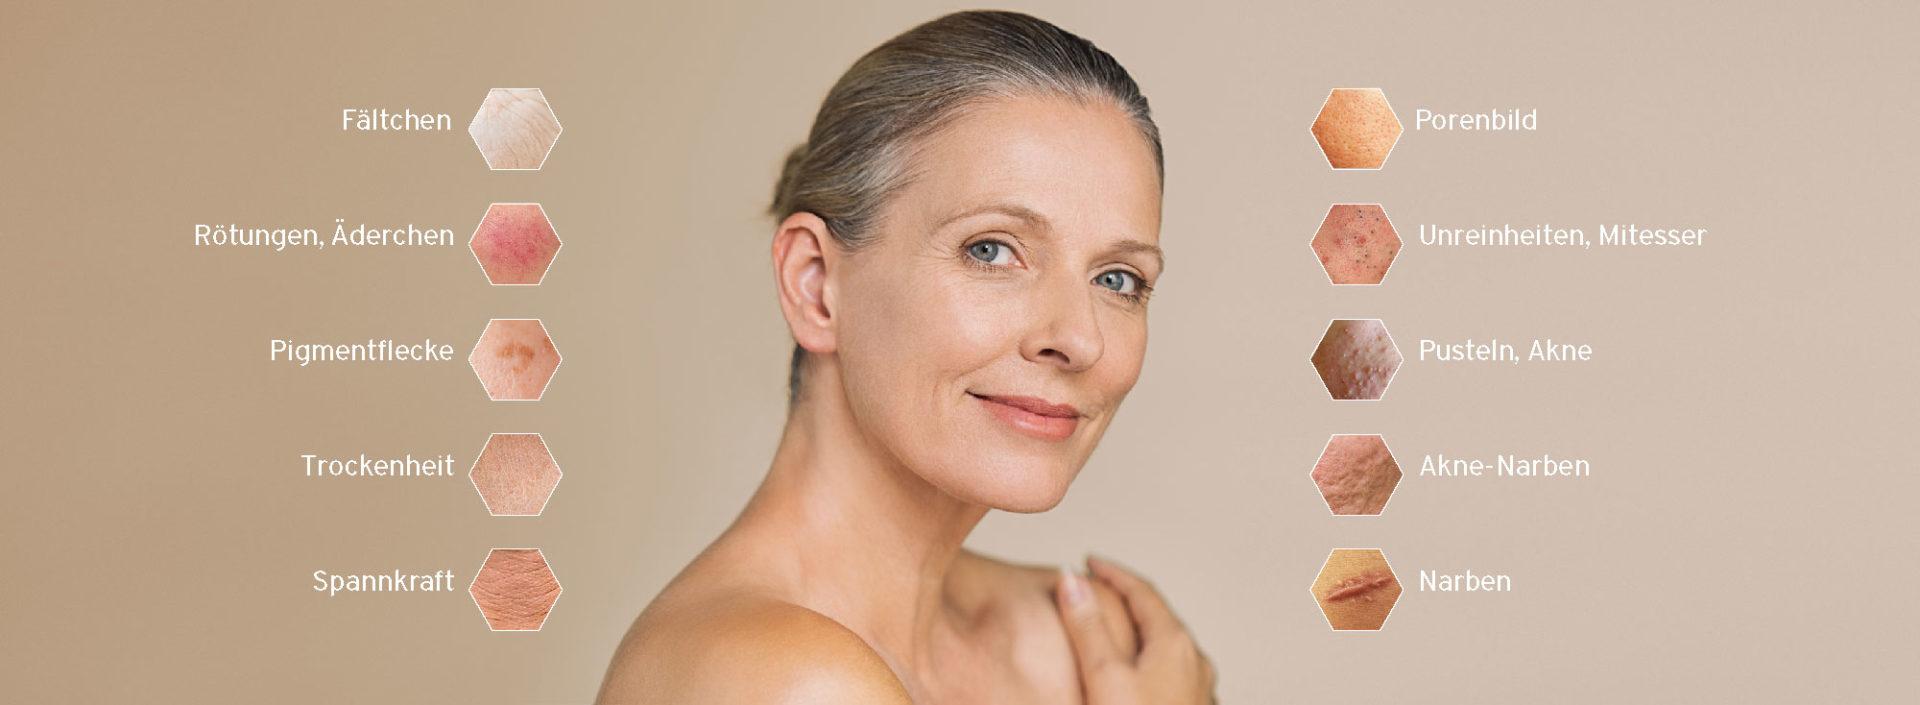 Triemer Aeshetics Dresden Ästhetik Kosmetik Medizin Schönheit Schönheitsmedizin Haut Hautqualität